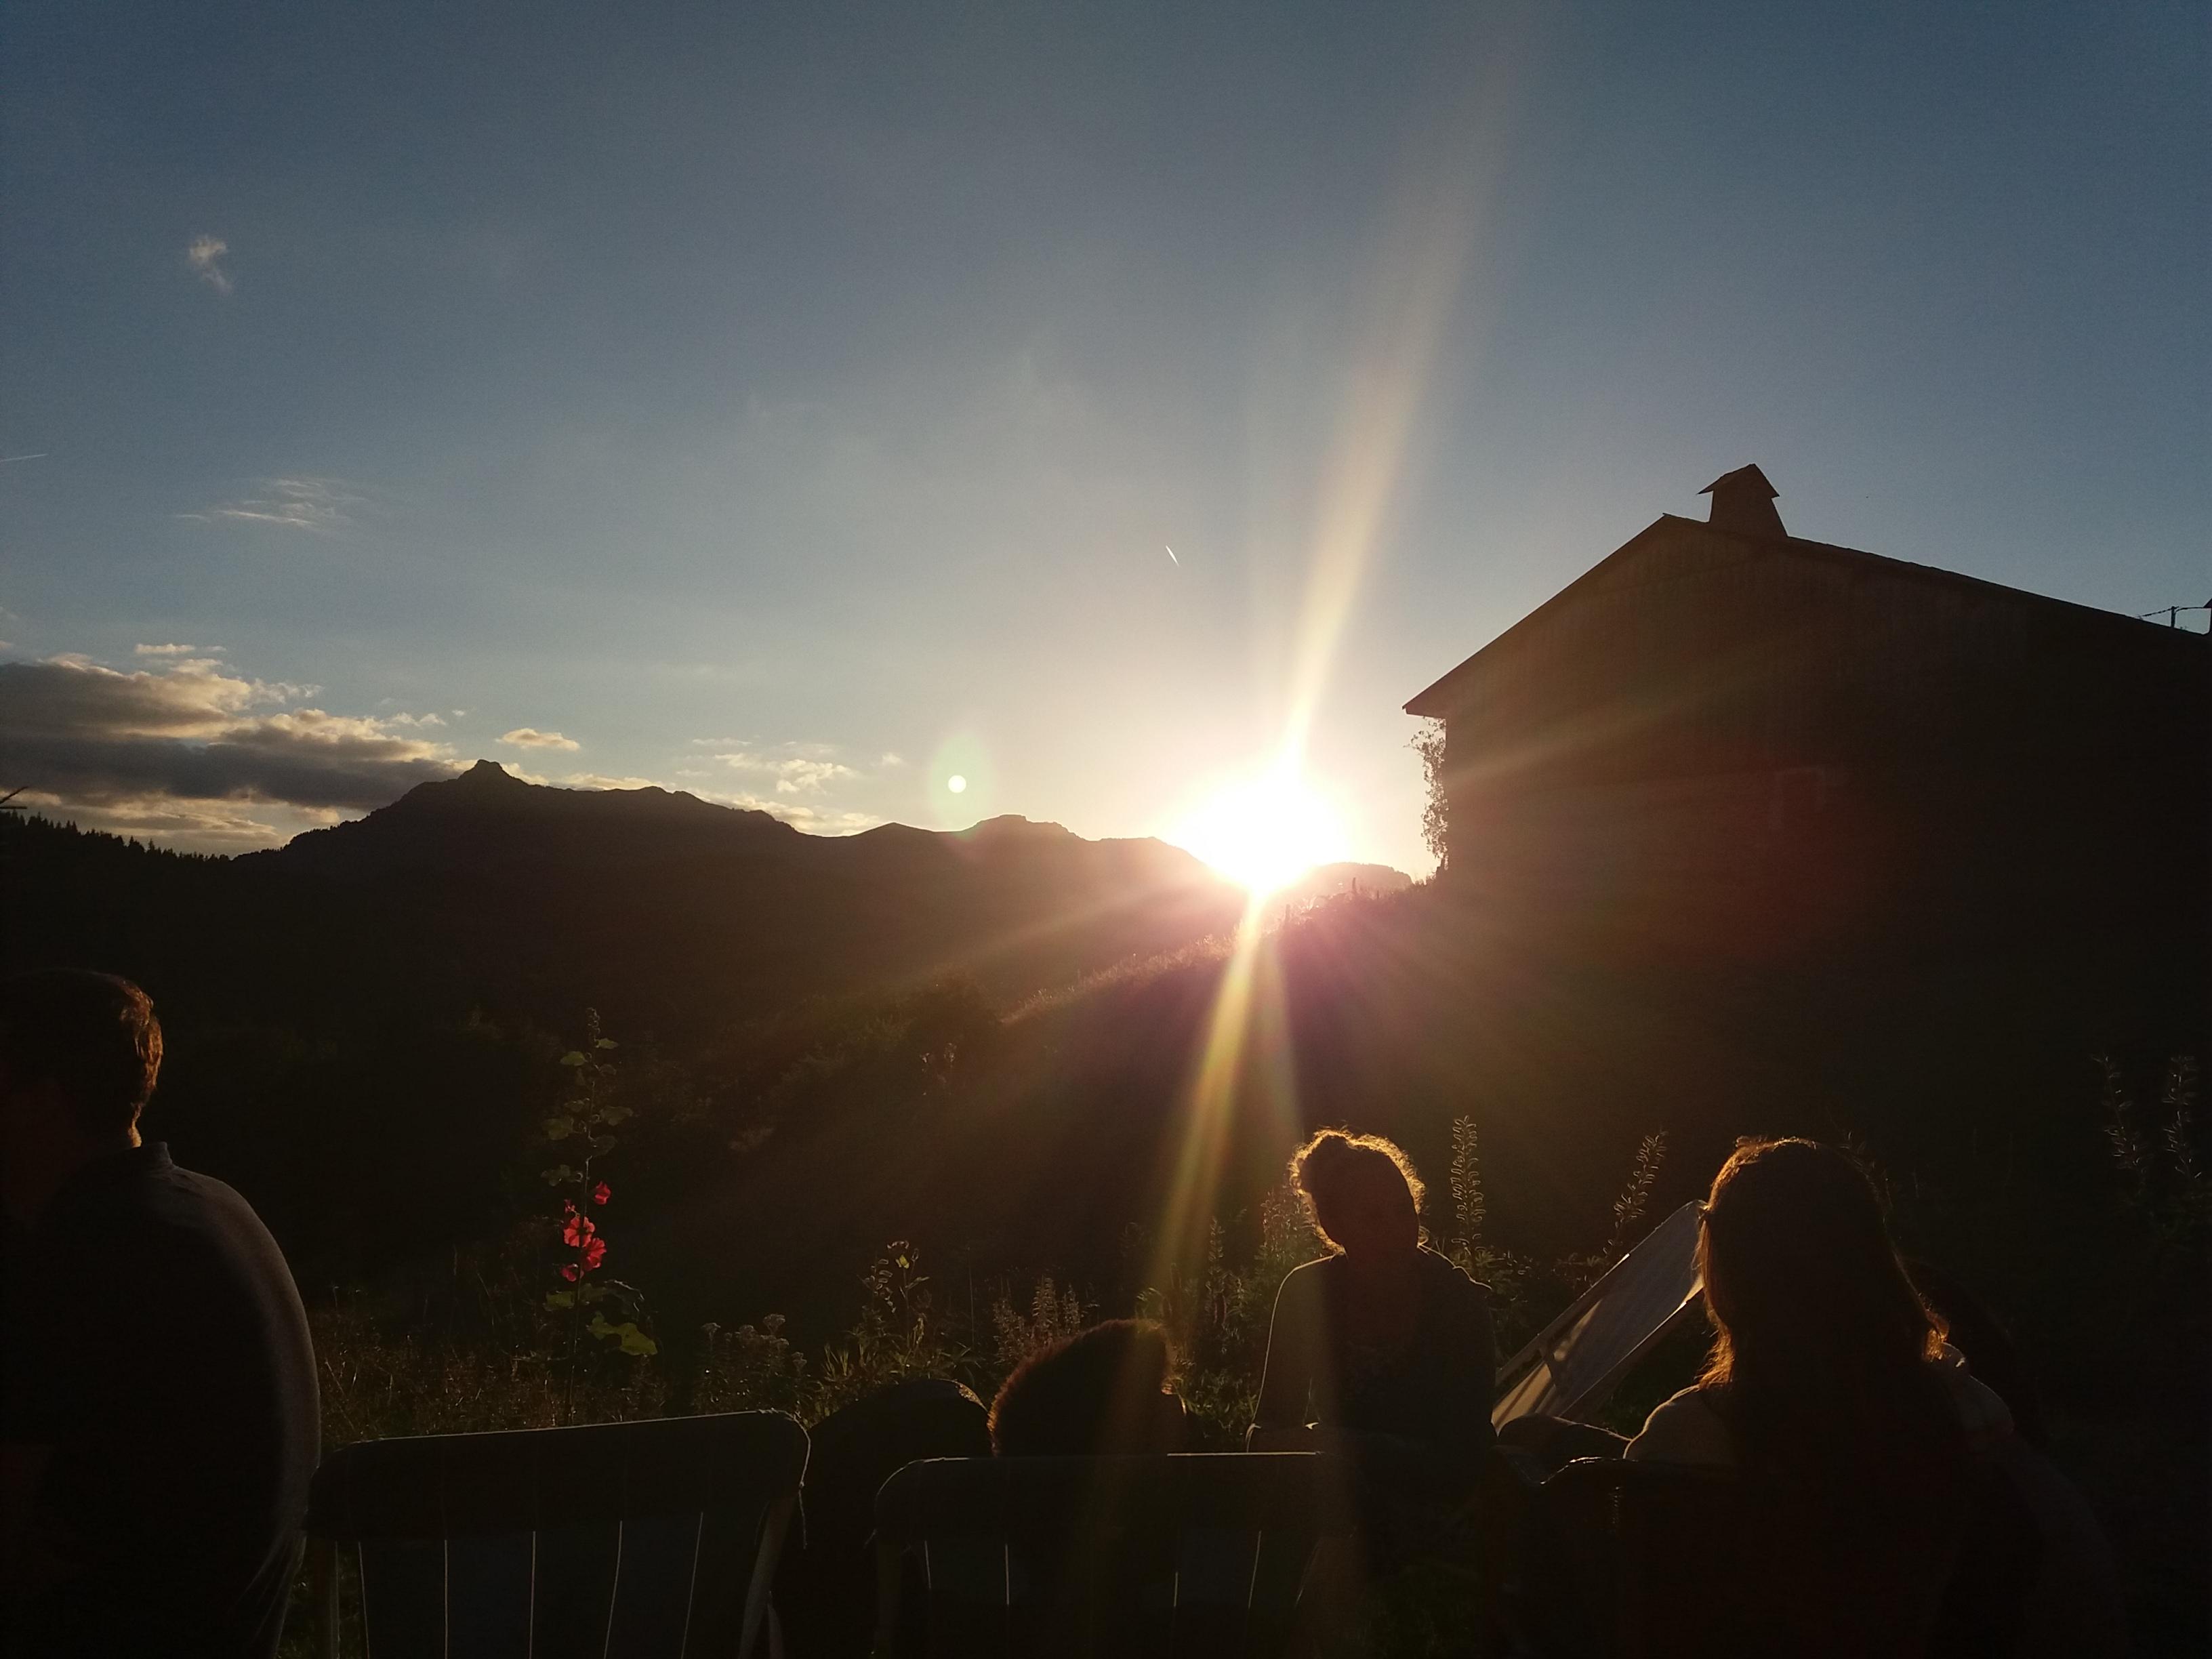 vista chalet puesta del sol